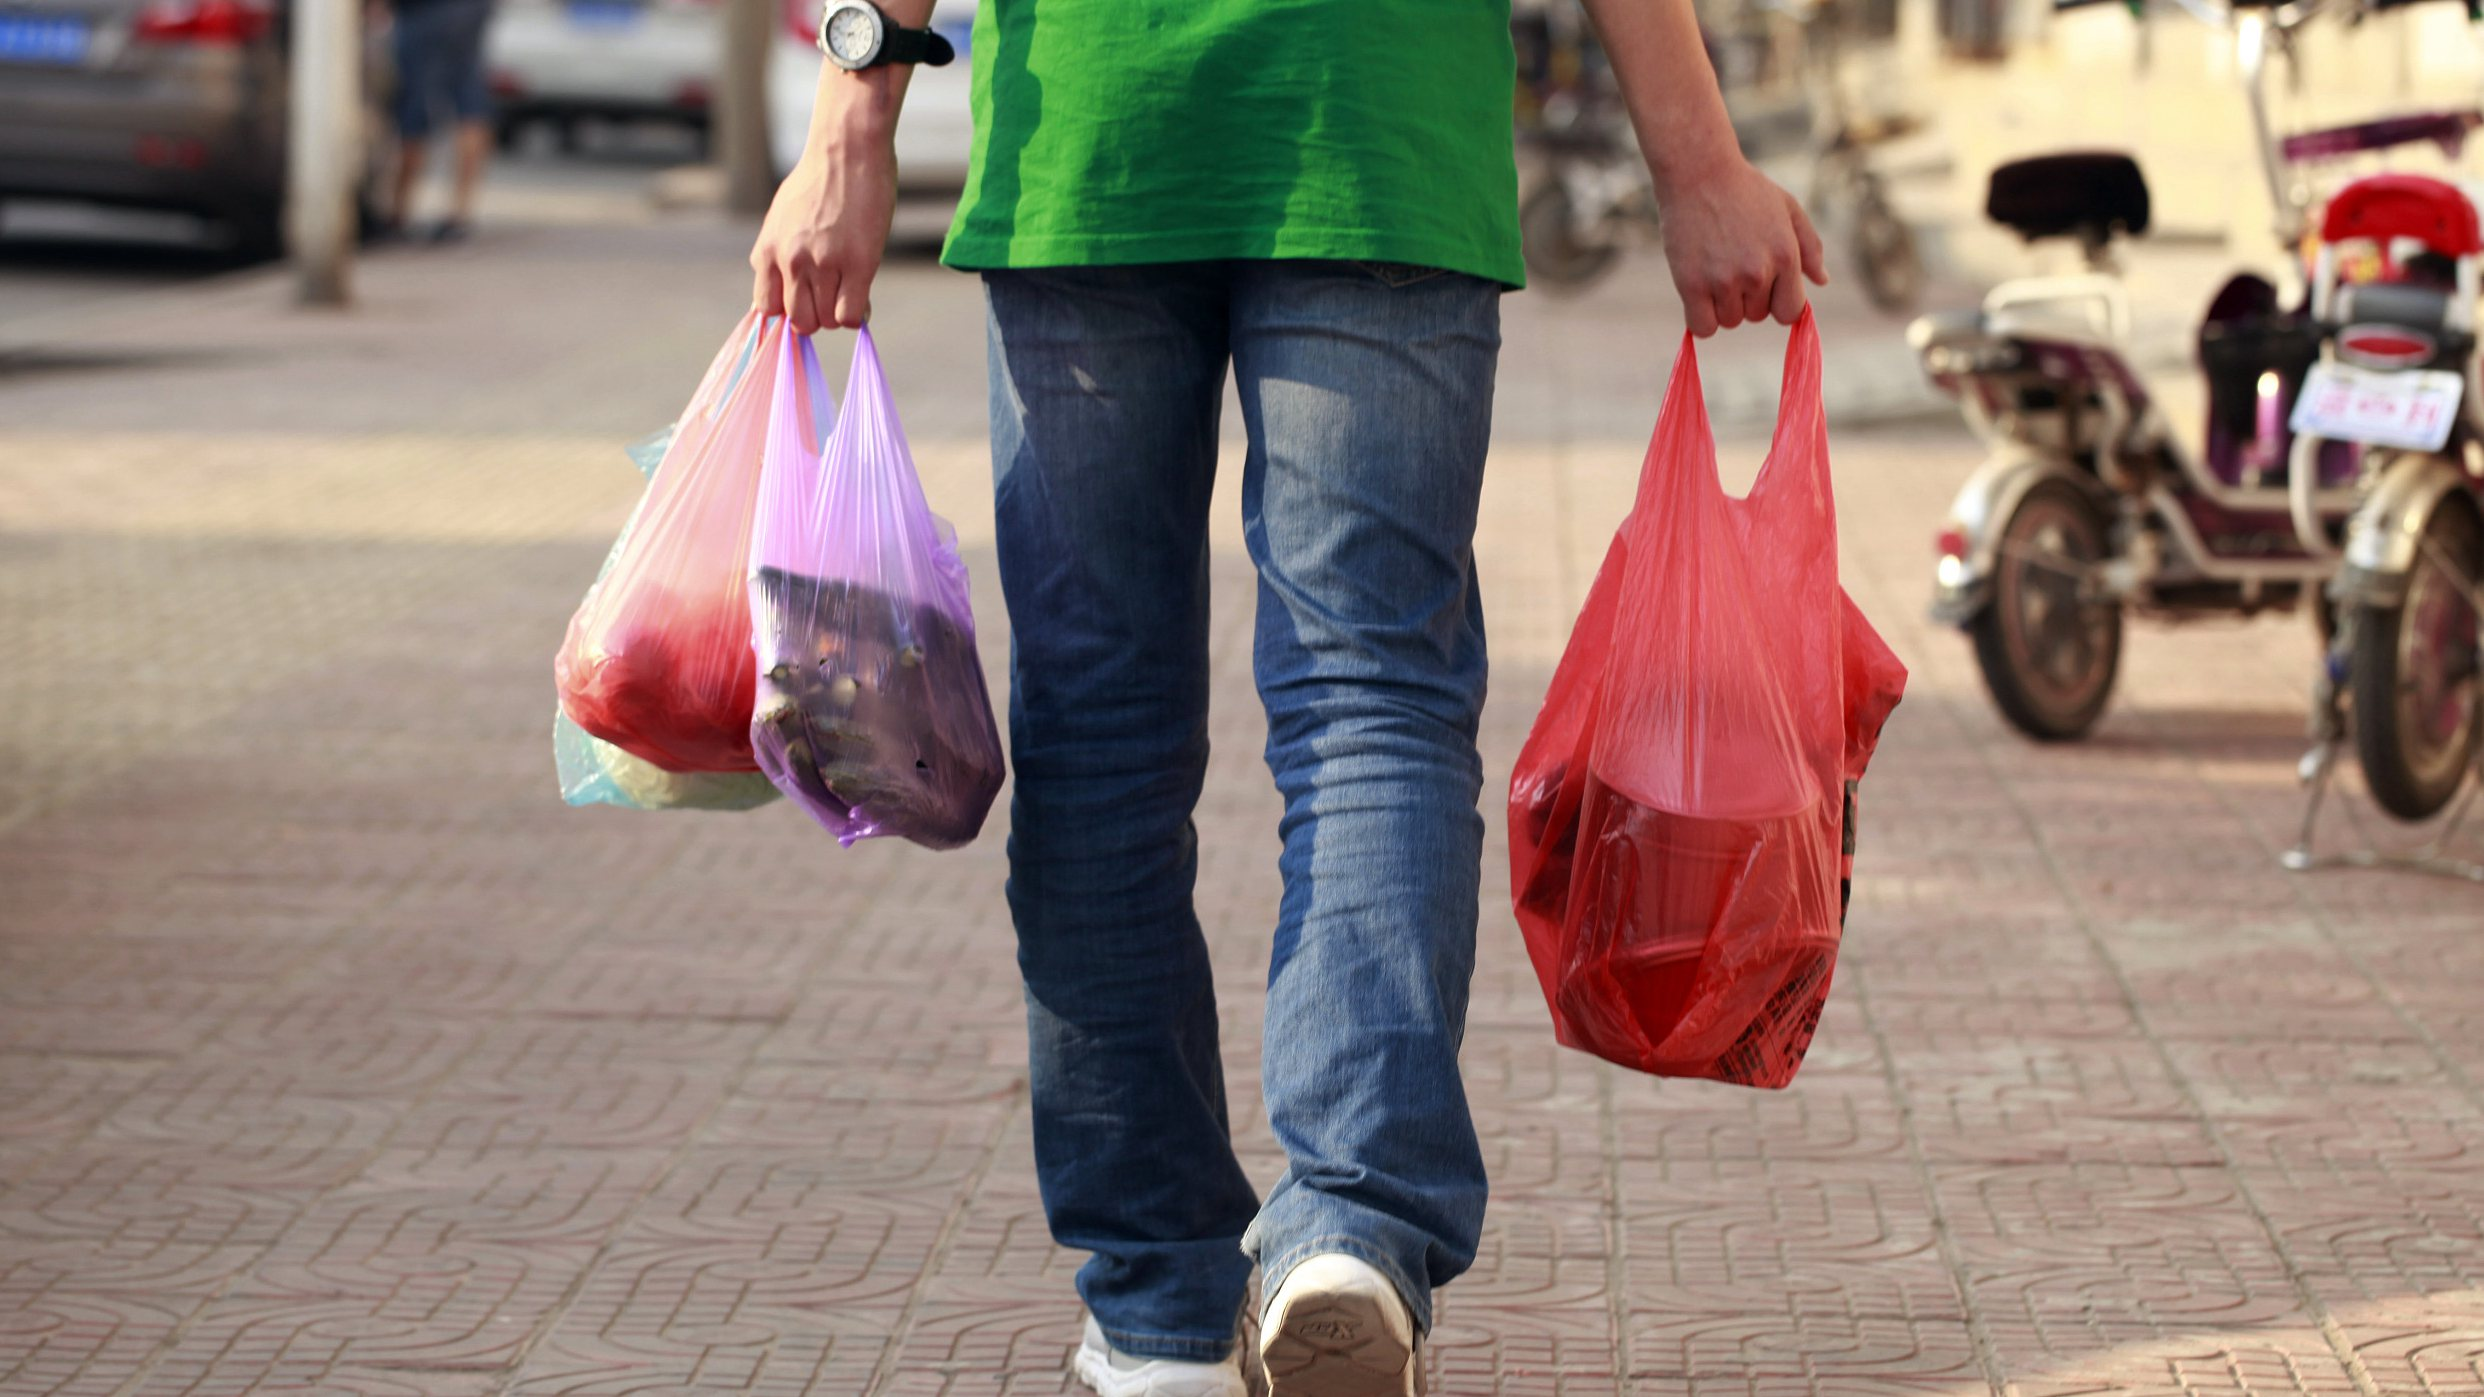 Beijing going green: Public advice sought on plastic ban